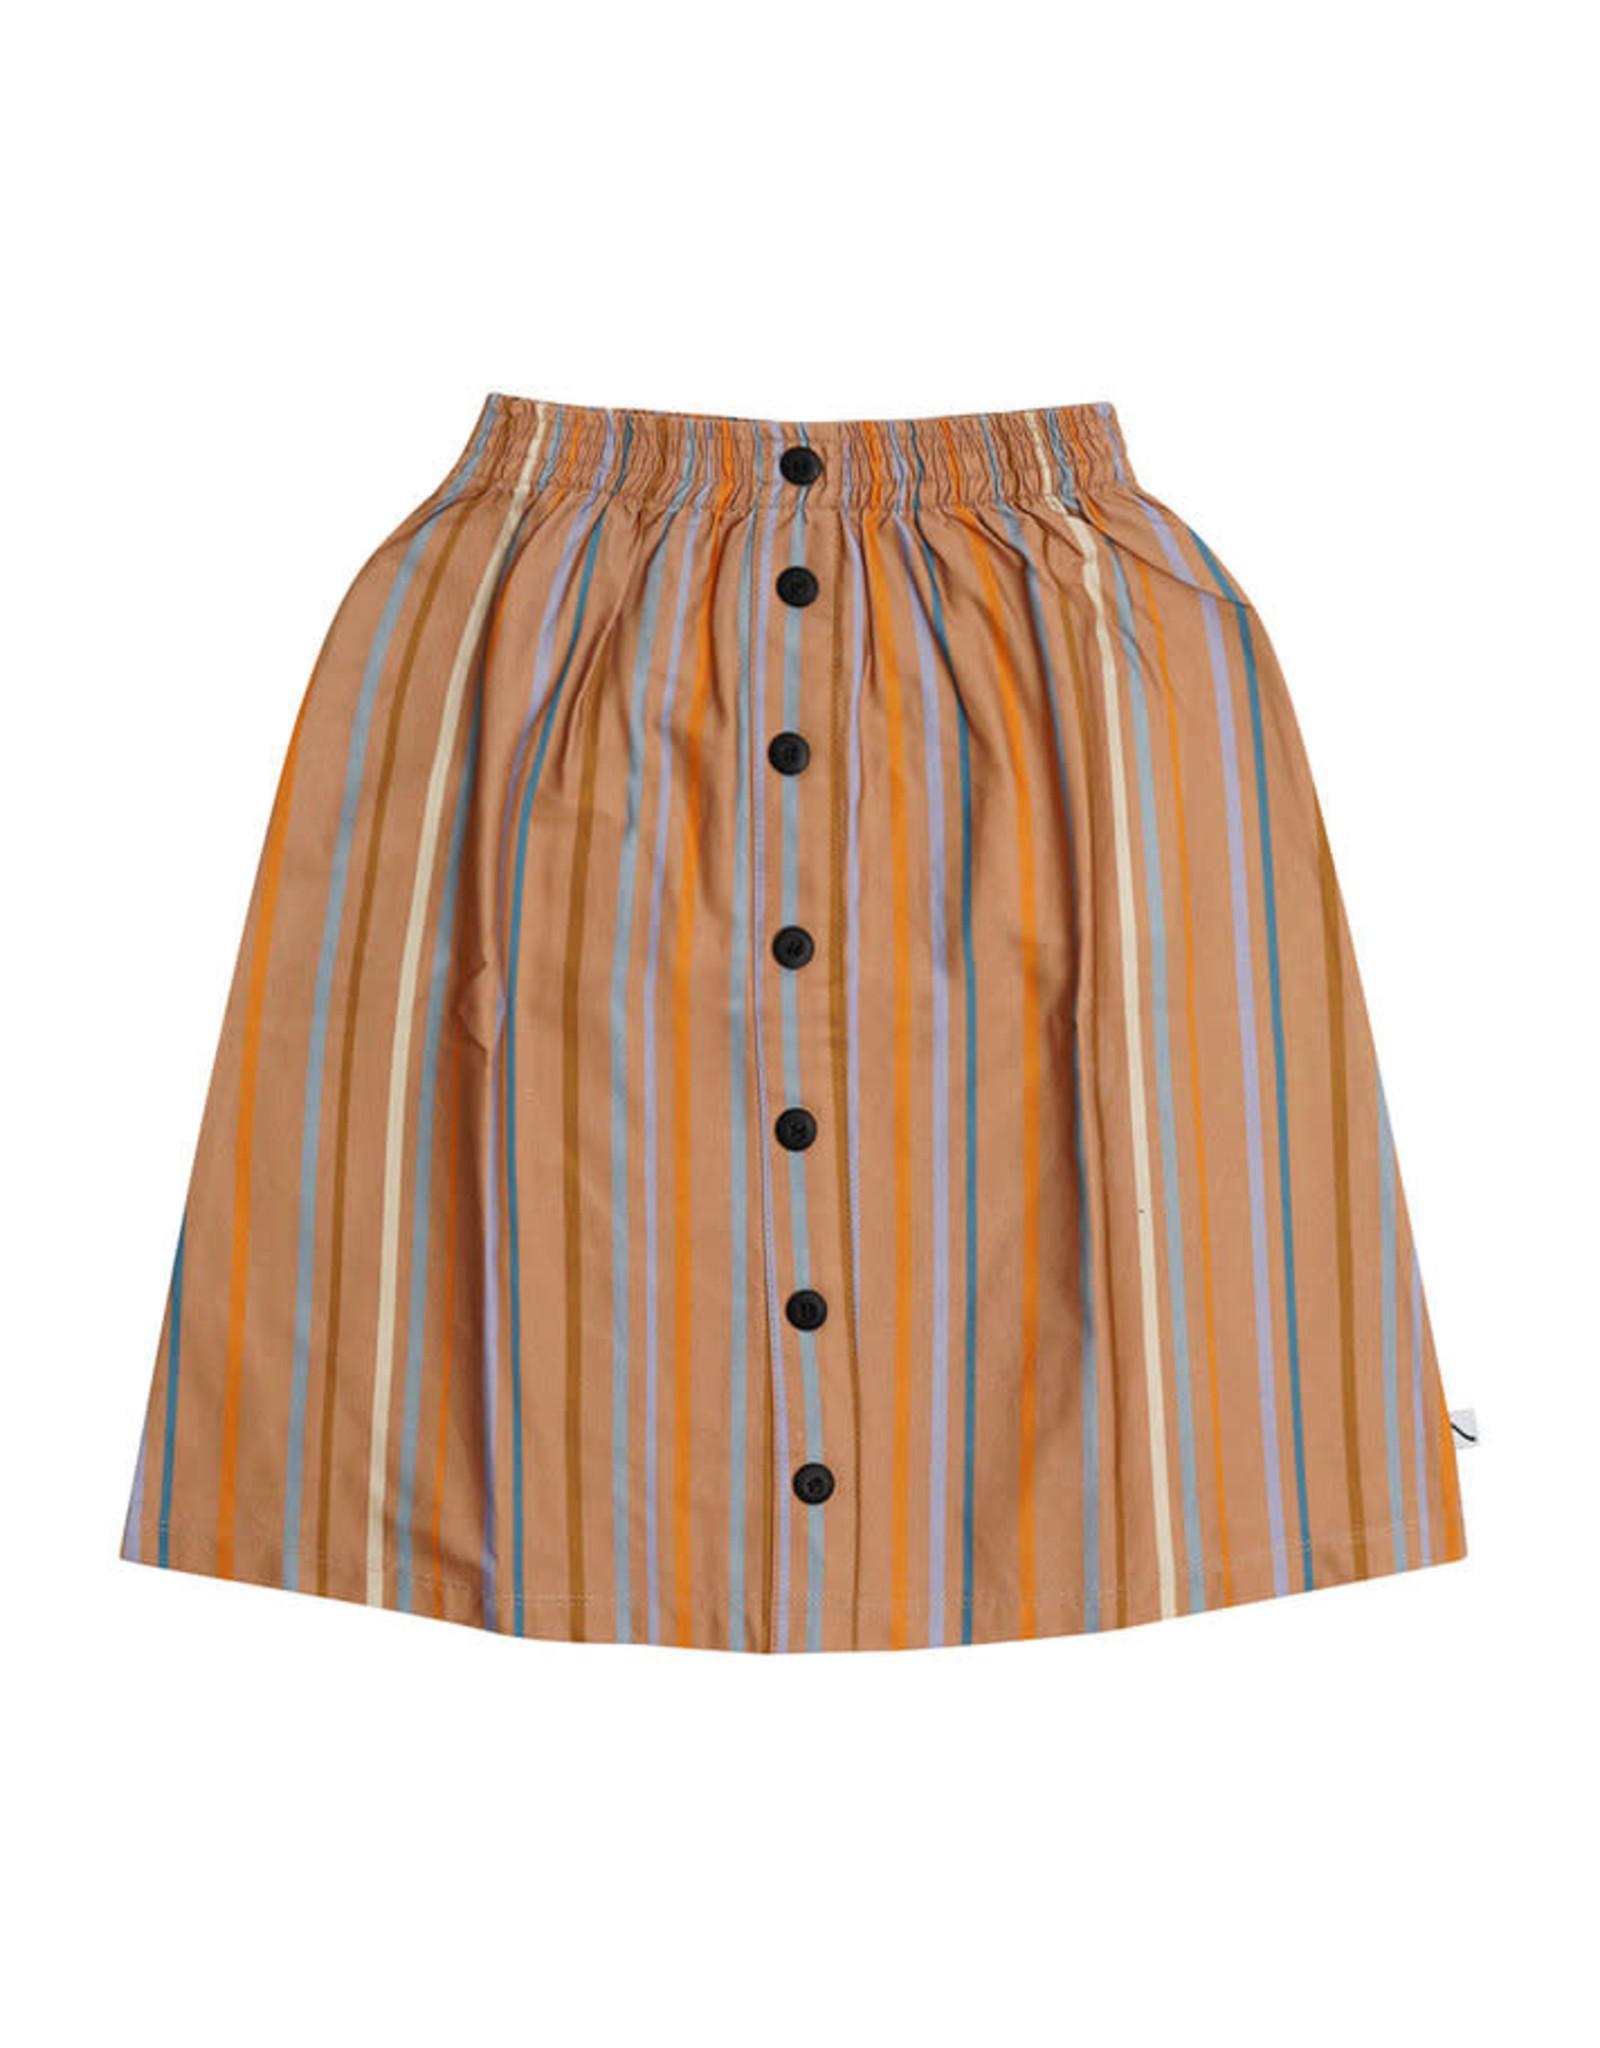 Carlijn Q Carlijn Q Long Multi color stripes skirt with buttons